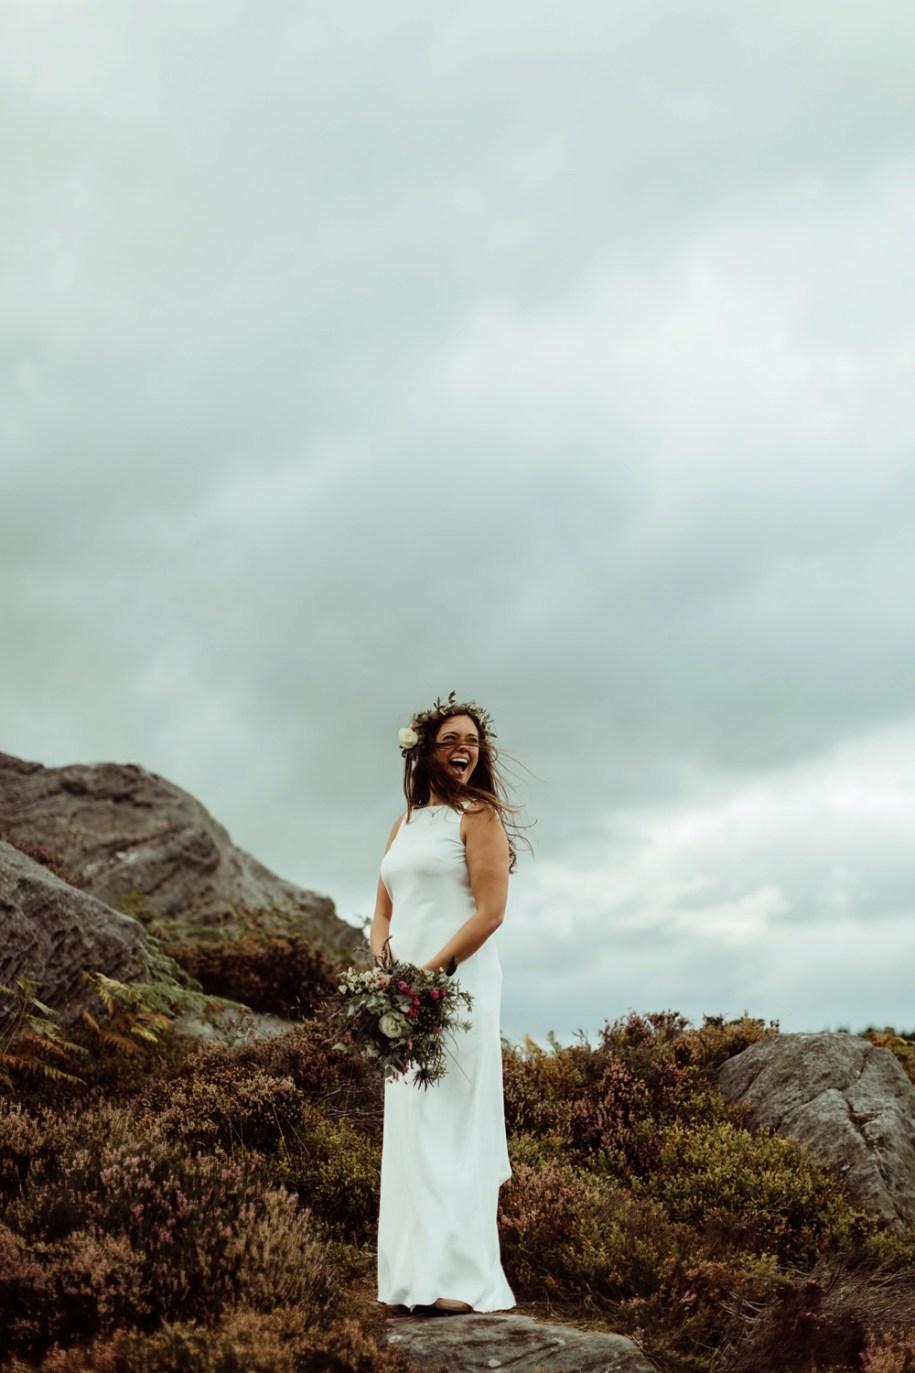 Boho bride among the rocks in Northumberland